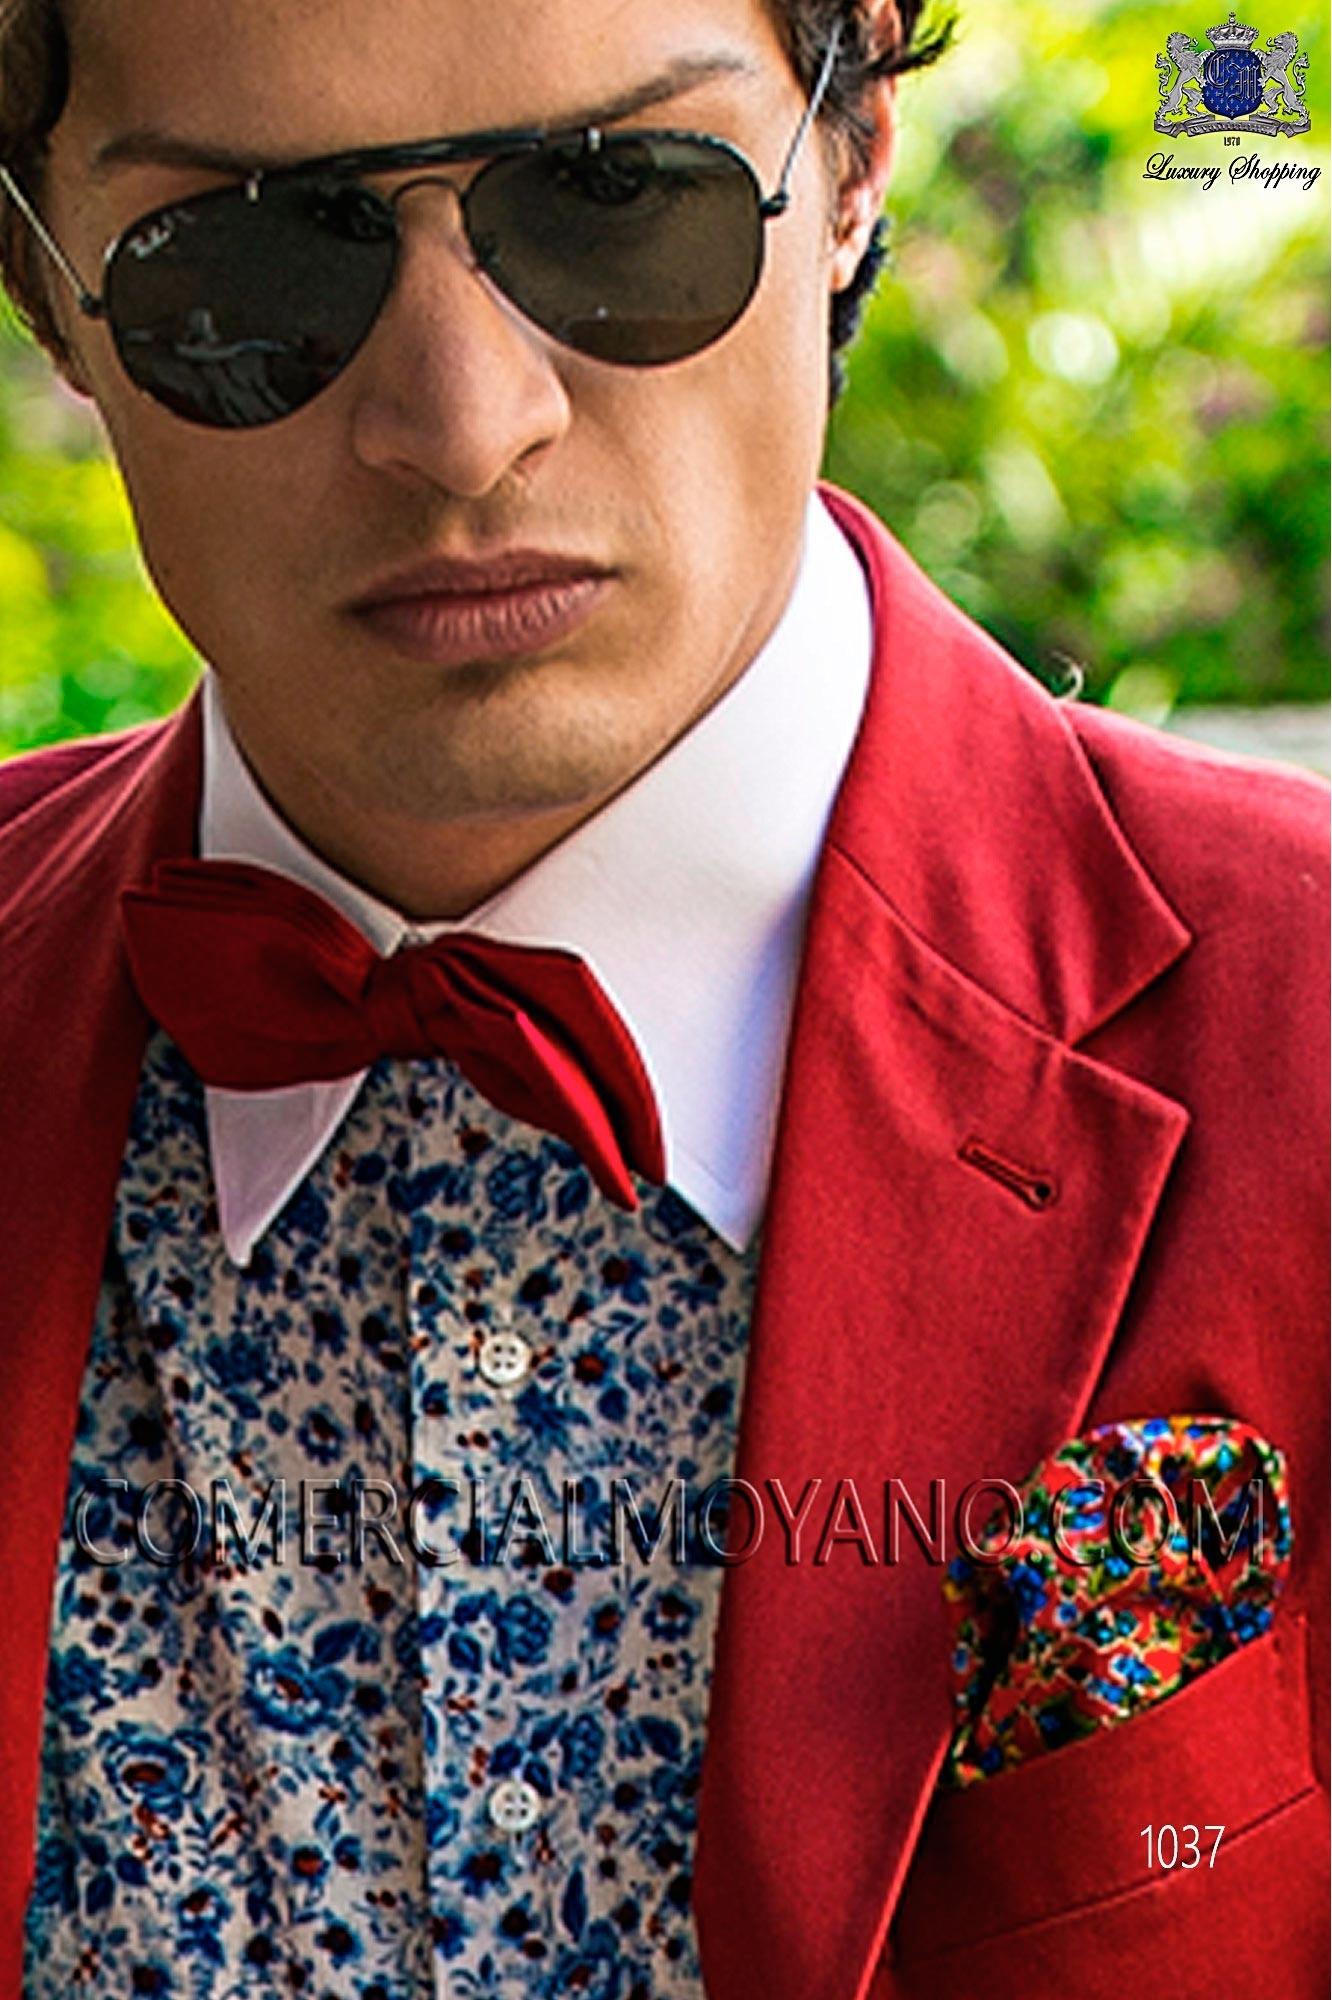 Traje Hipster de novio rojo modelo: 1037 Ottavio Nuccio Gala colección Hipster 2017